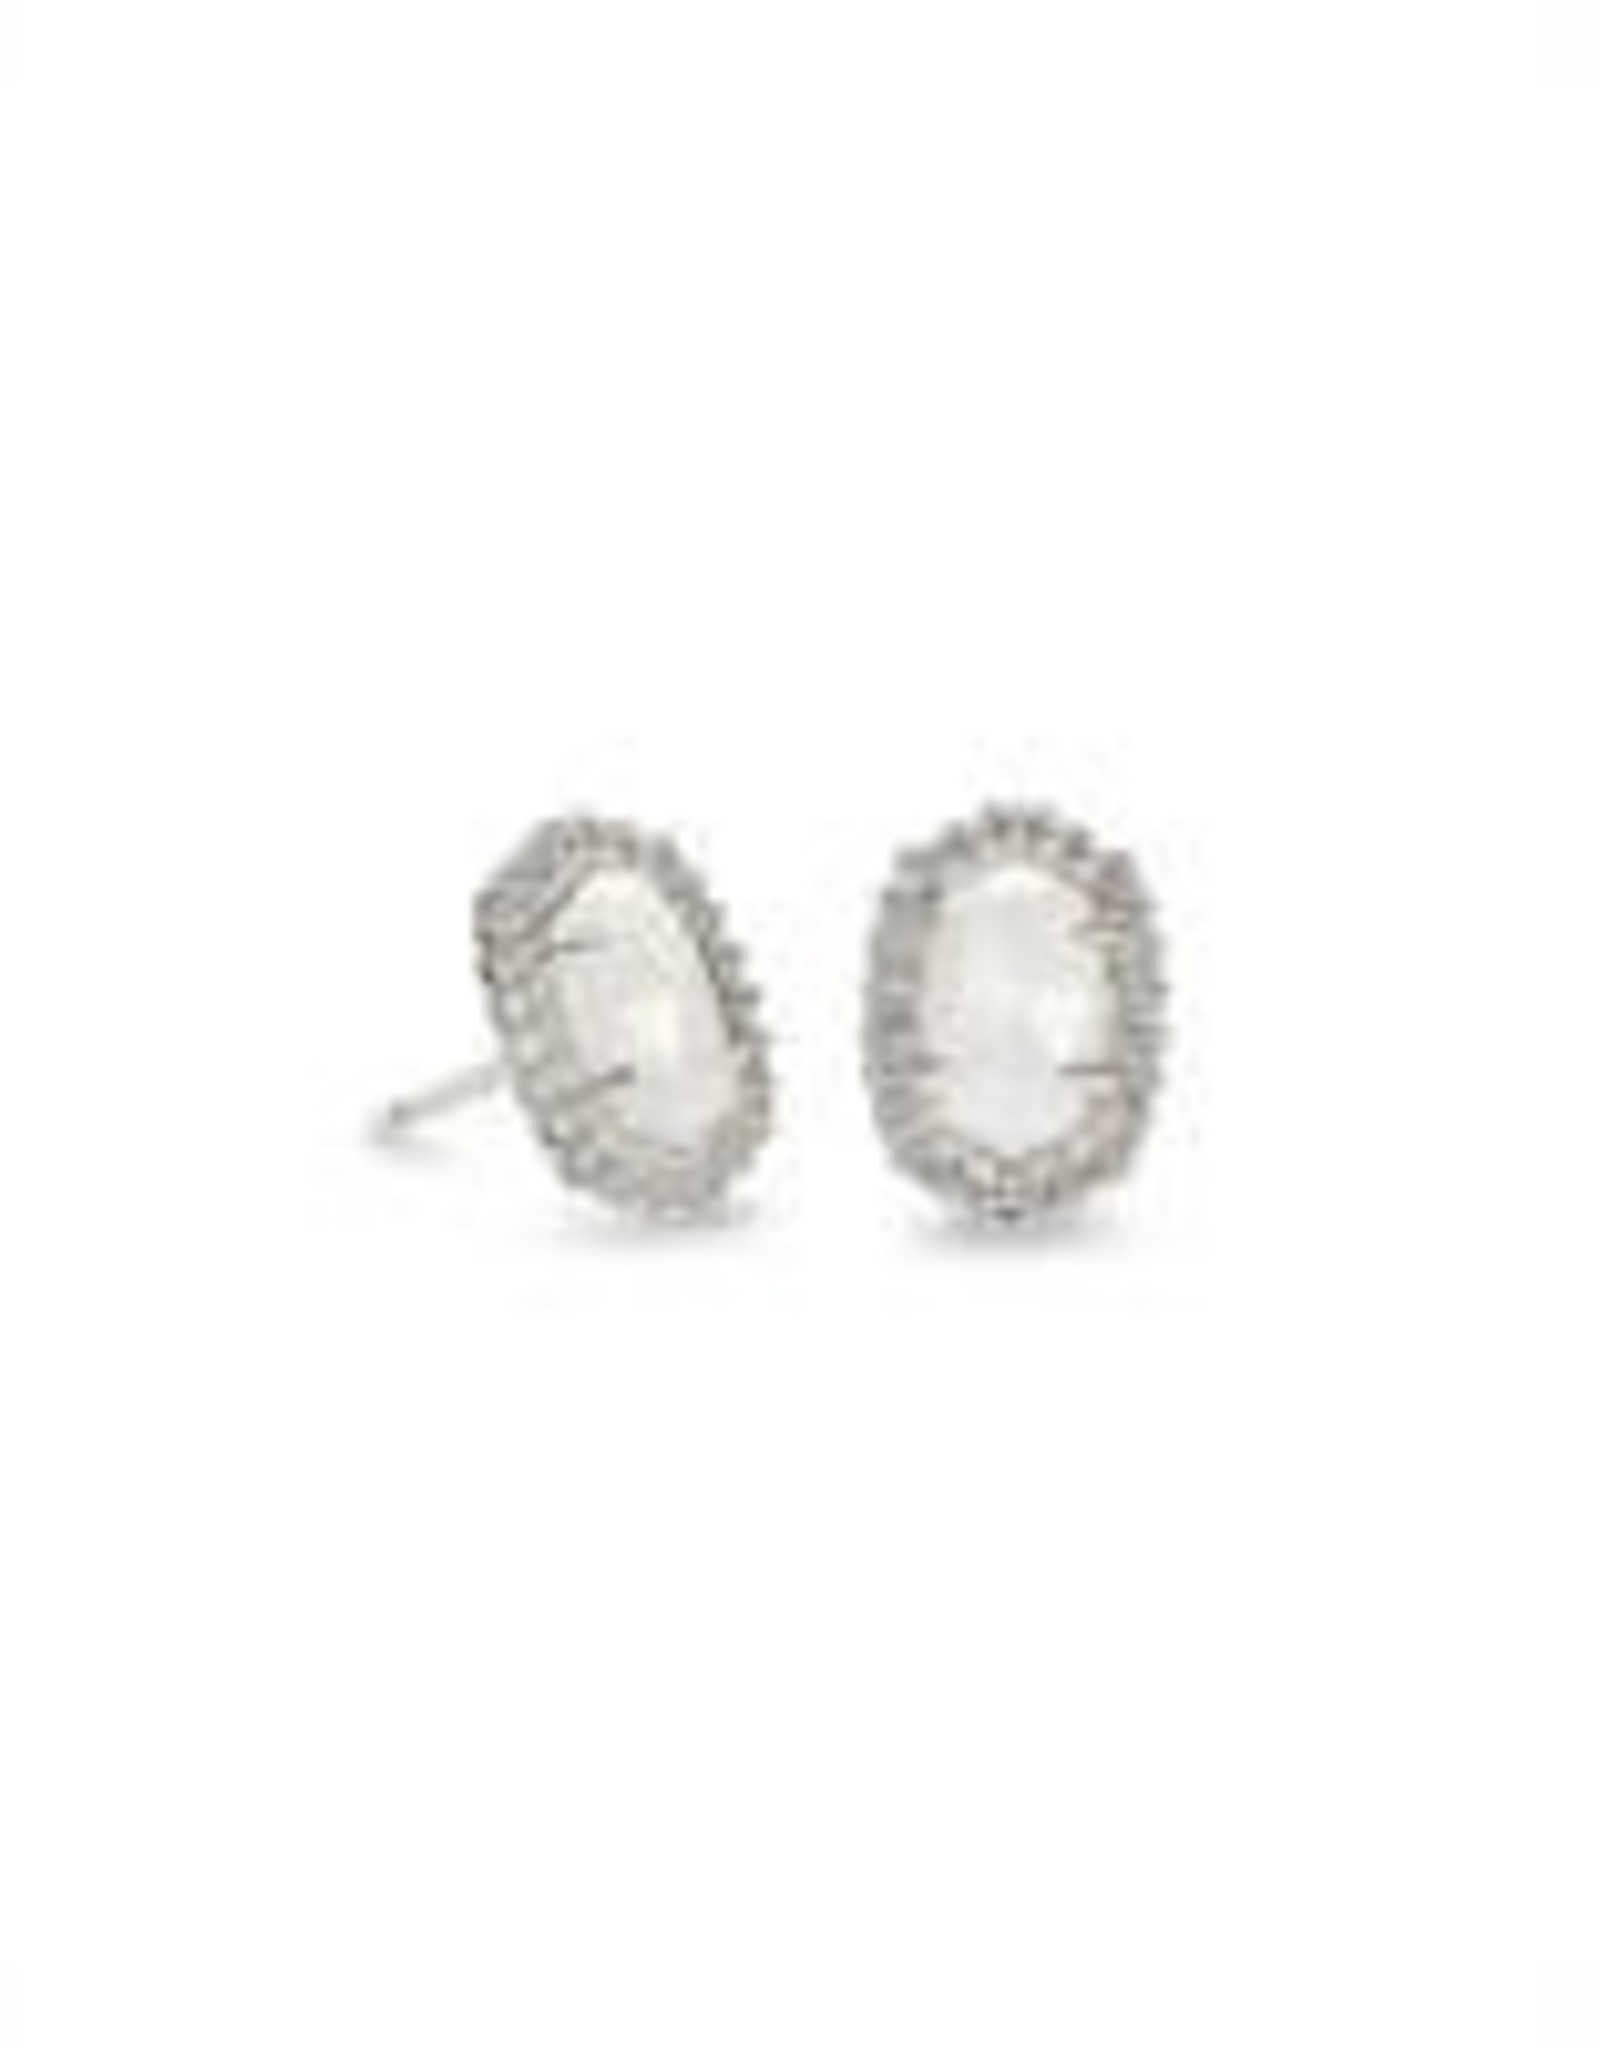 Kendra Scott Kendra Scott Cade Rhodium Earring